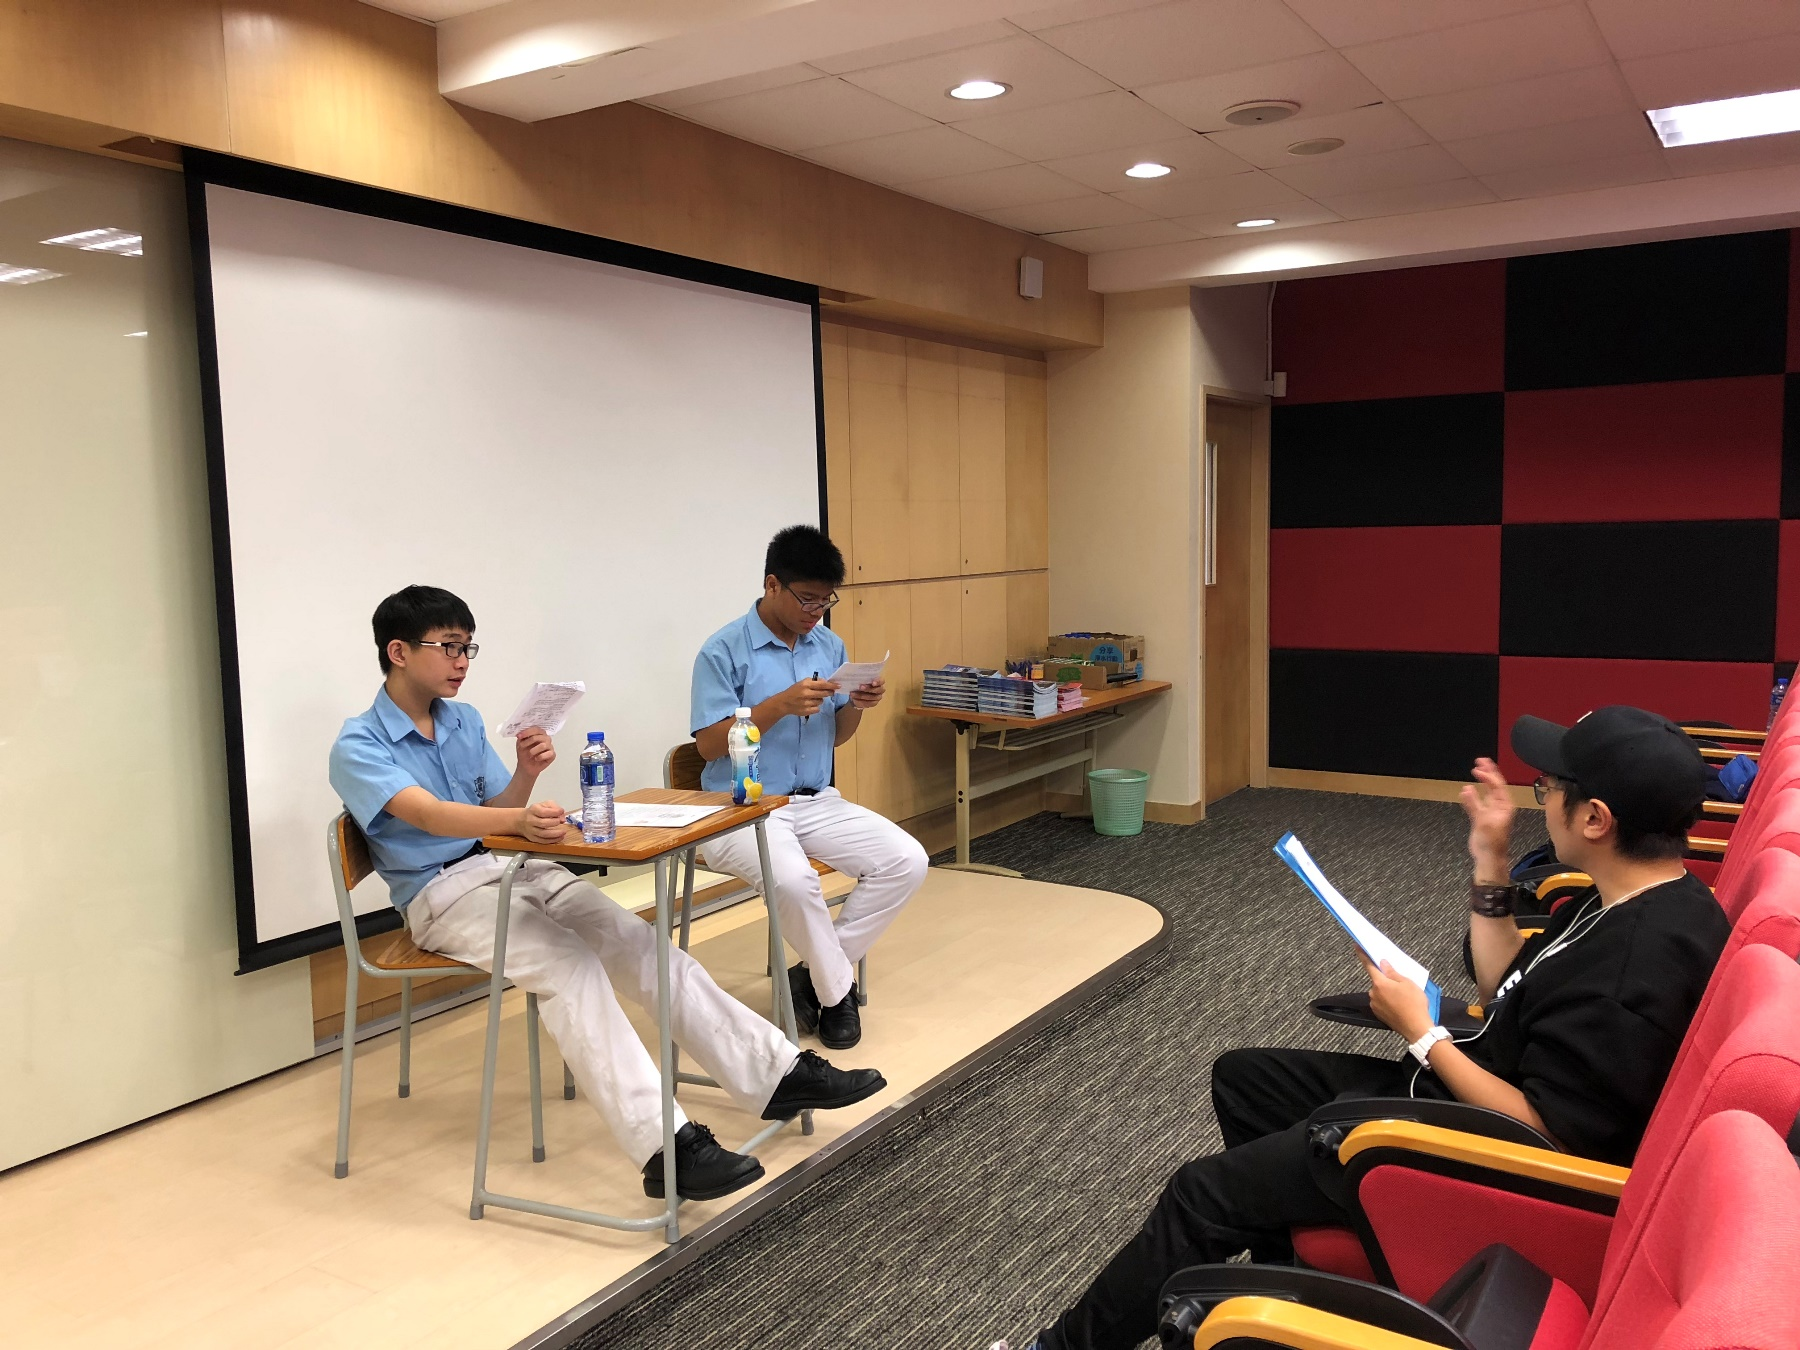 http://www.npc.edu.hk/sites/default/files/1_1413.jpg